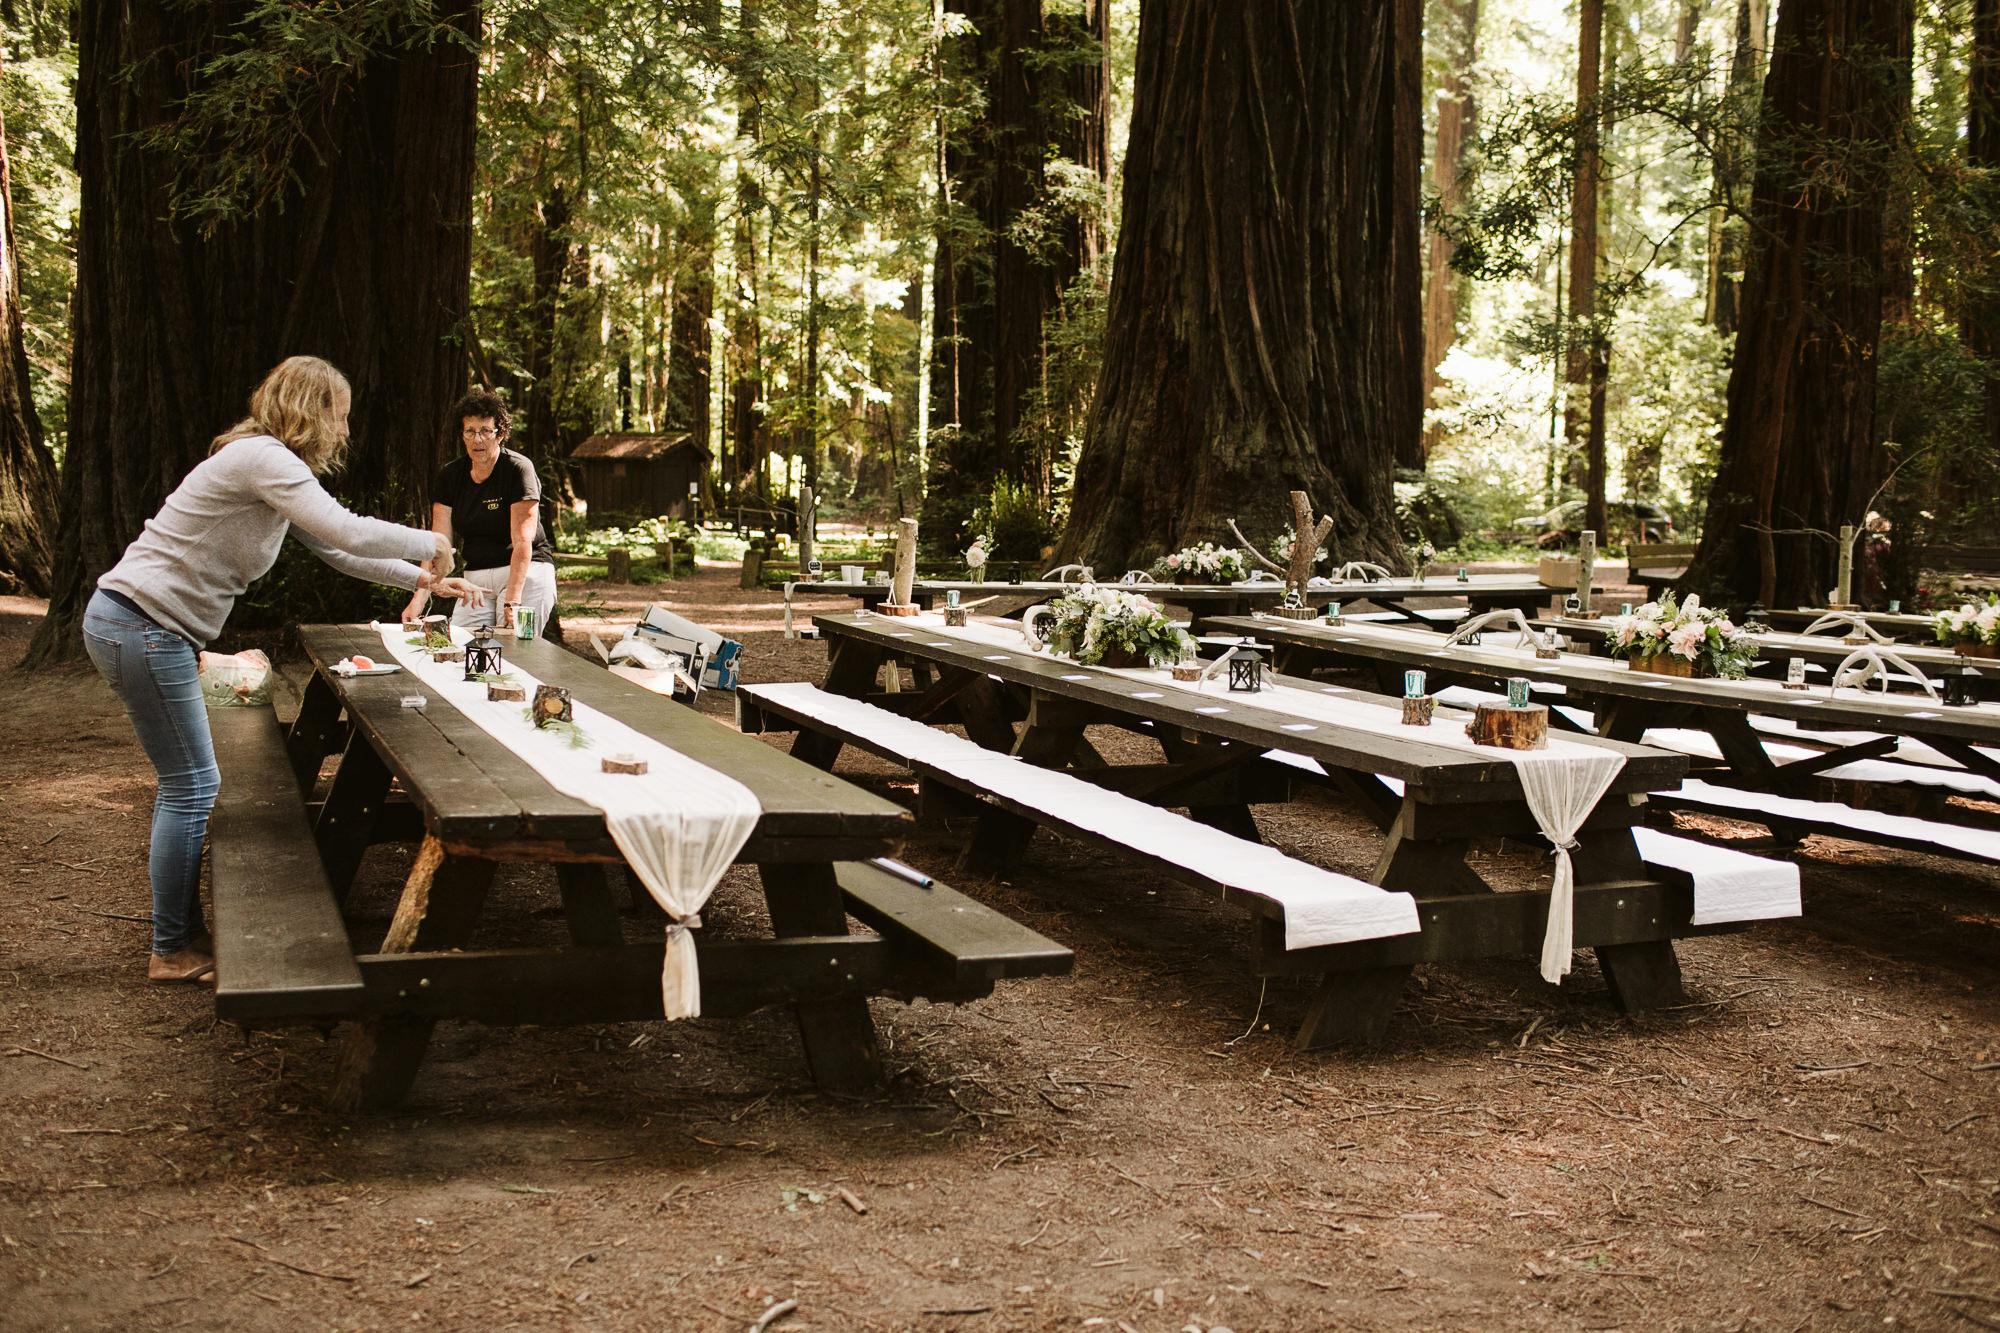 California-wedding-photographer-alfonso-flores-pamplin-groove-113.jpg